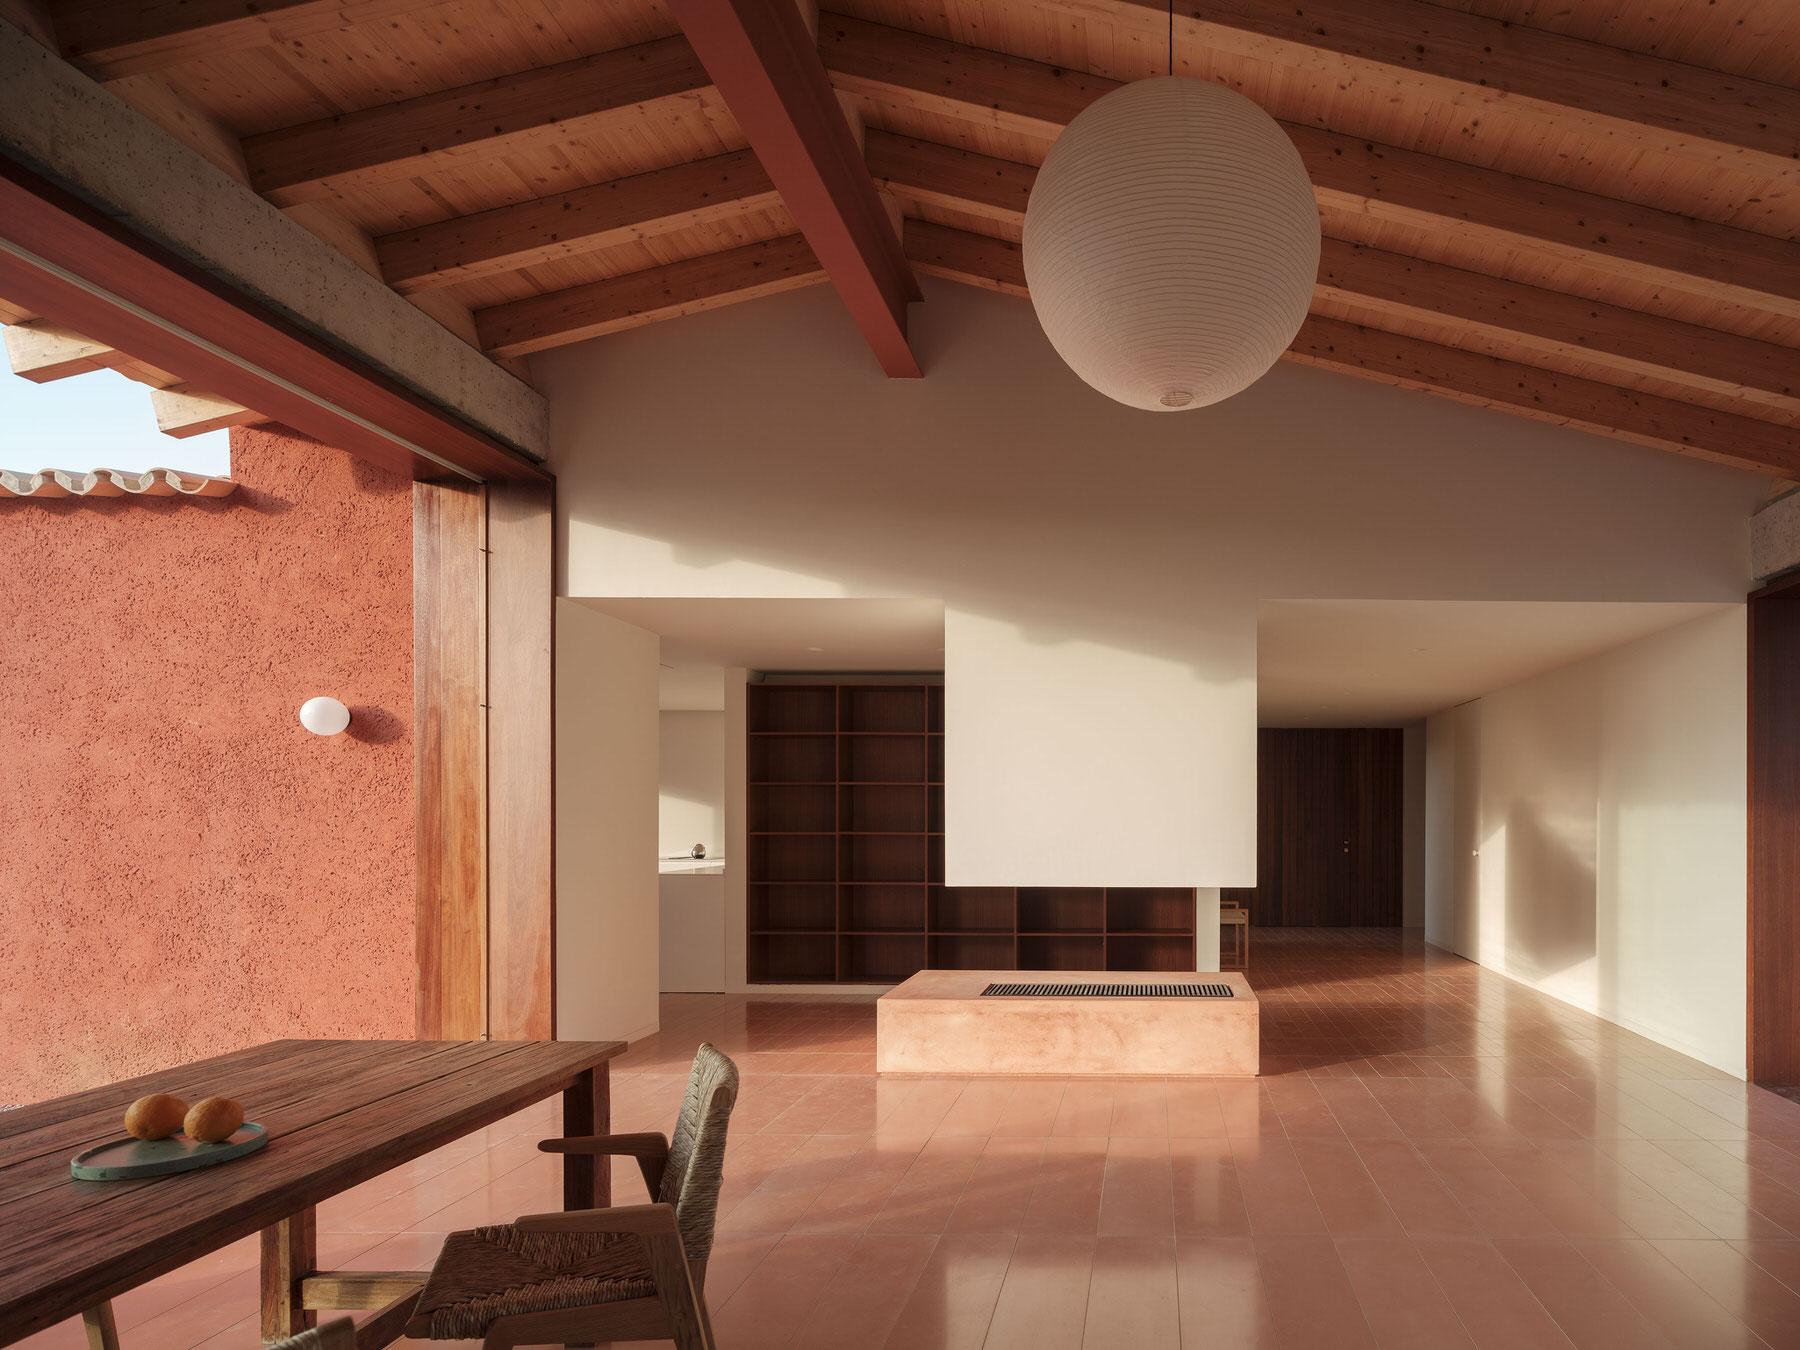 Santa Maria Lovers House Mallorca Isla Architects Photo Luis Diaz Diaz Yellowtrace 11